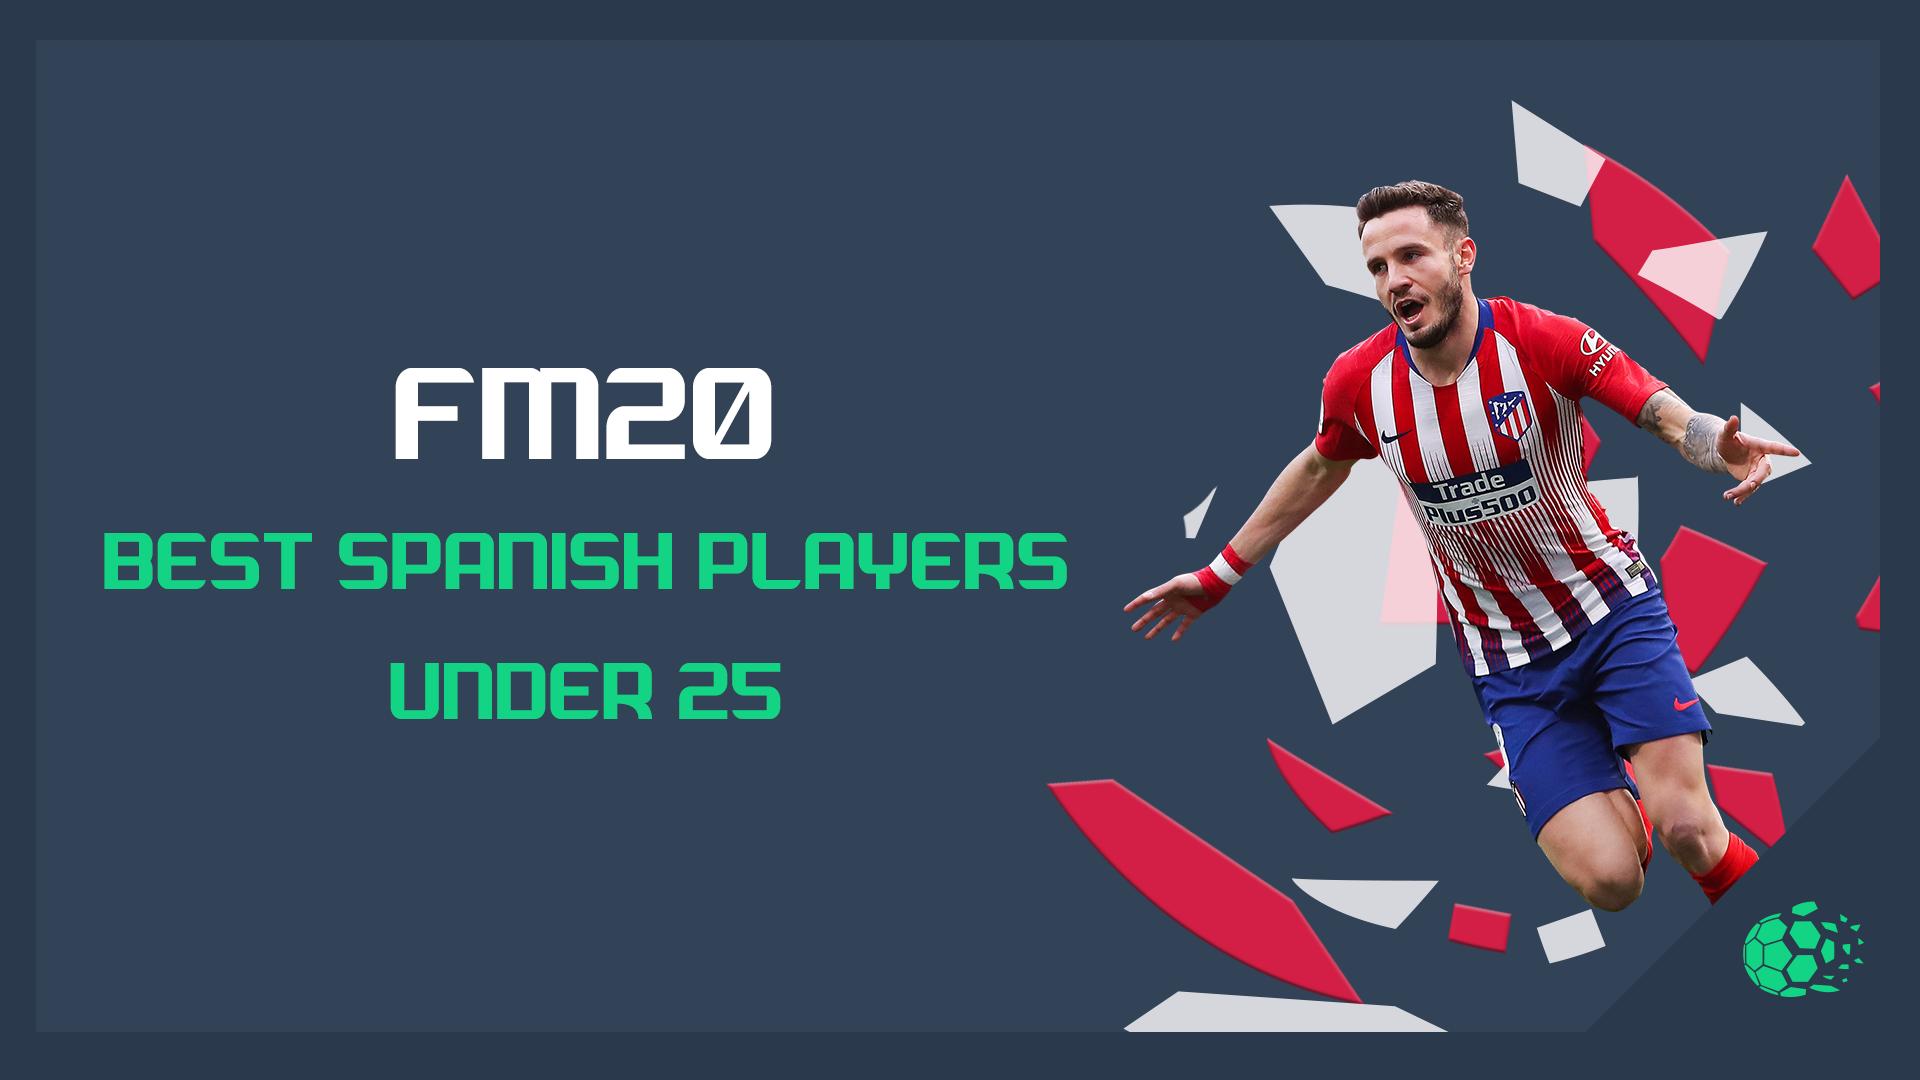 """FM20FM20: Best Spanish Players Under 25"" feature image"